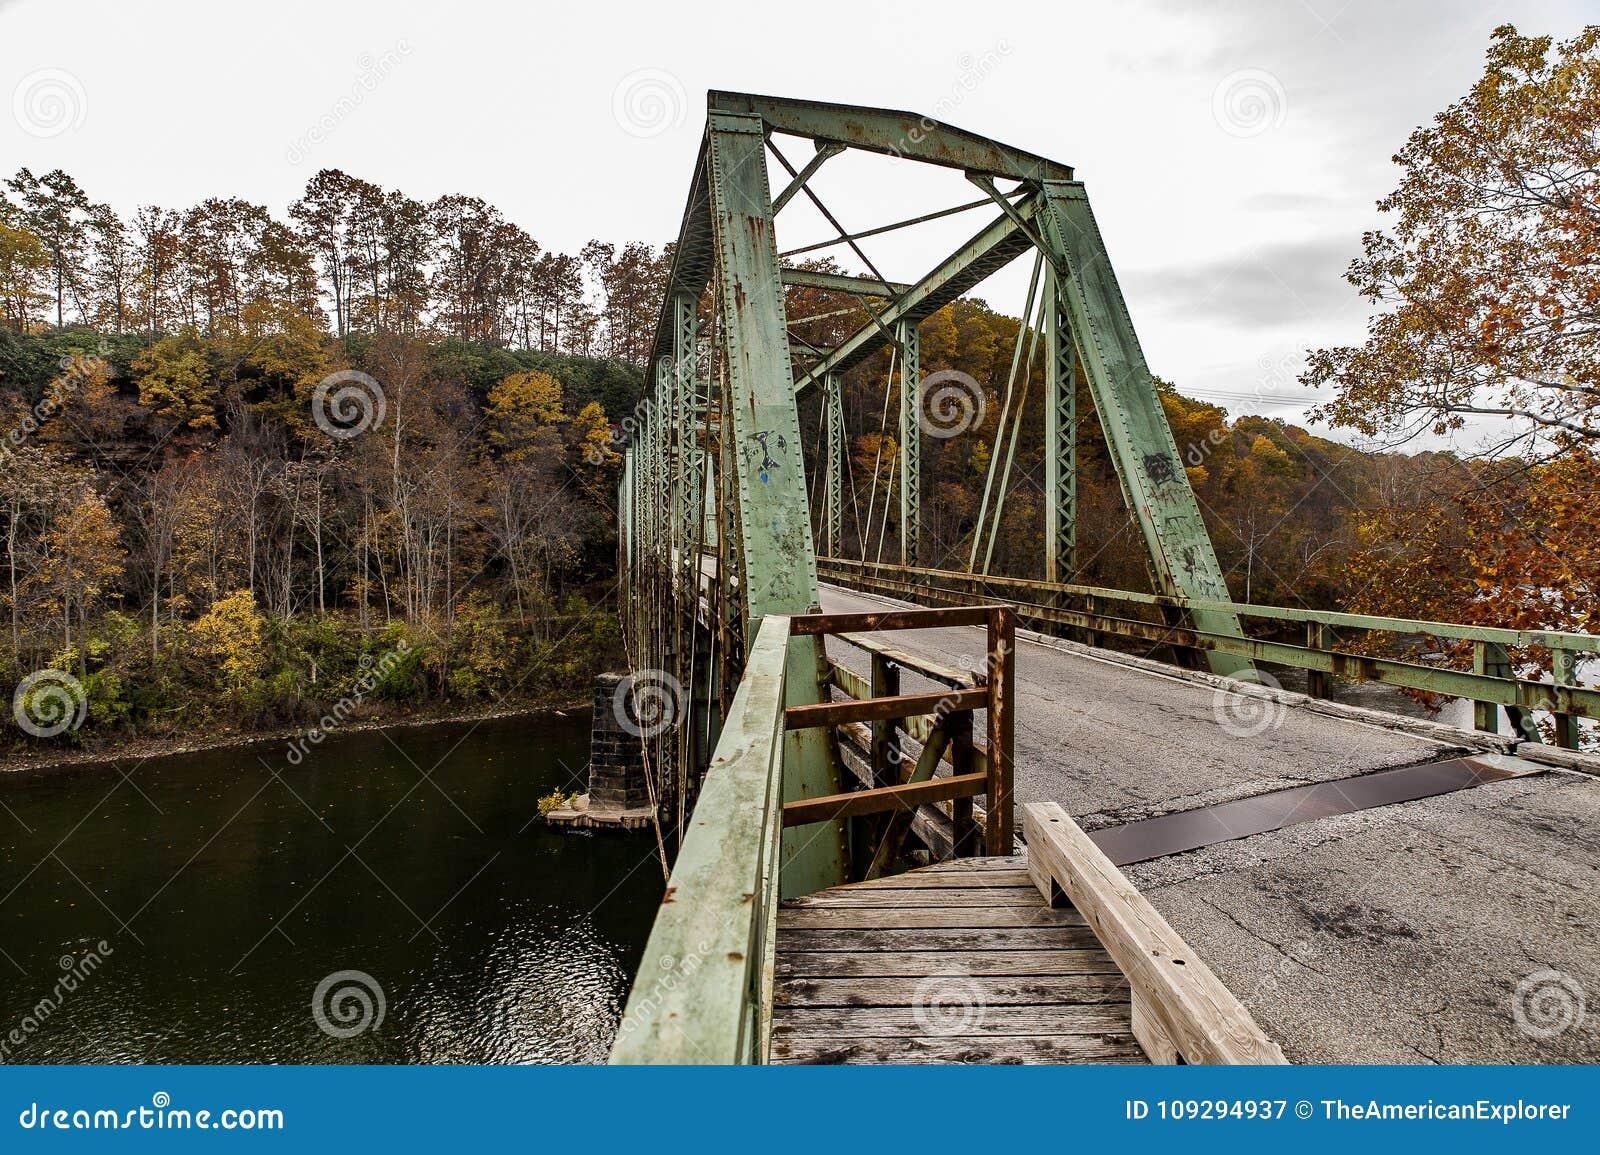 Ponte de fardo verde histórica no outono - Layton Bridge - o Condado de Fayette, Pensilvânia